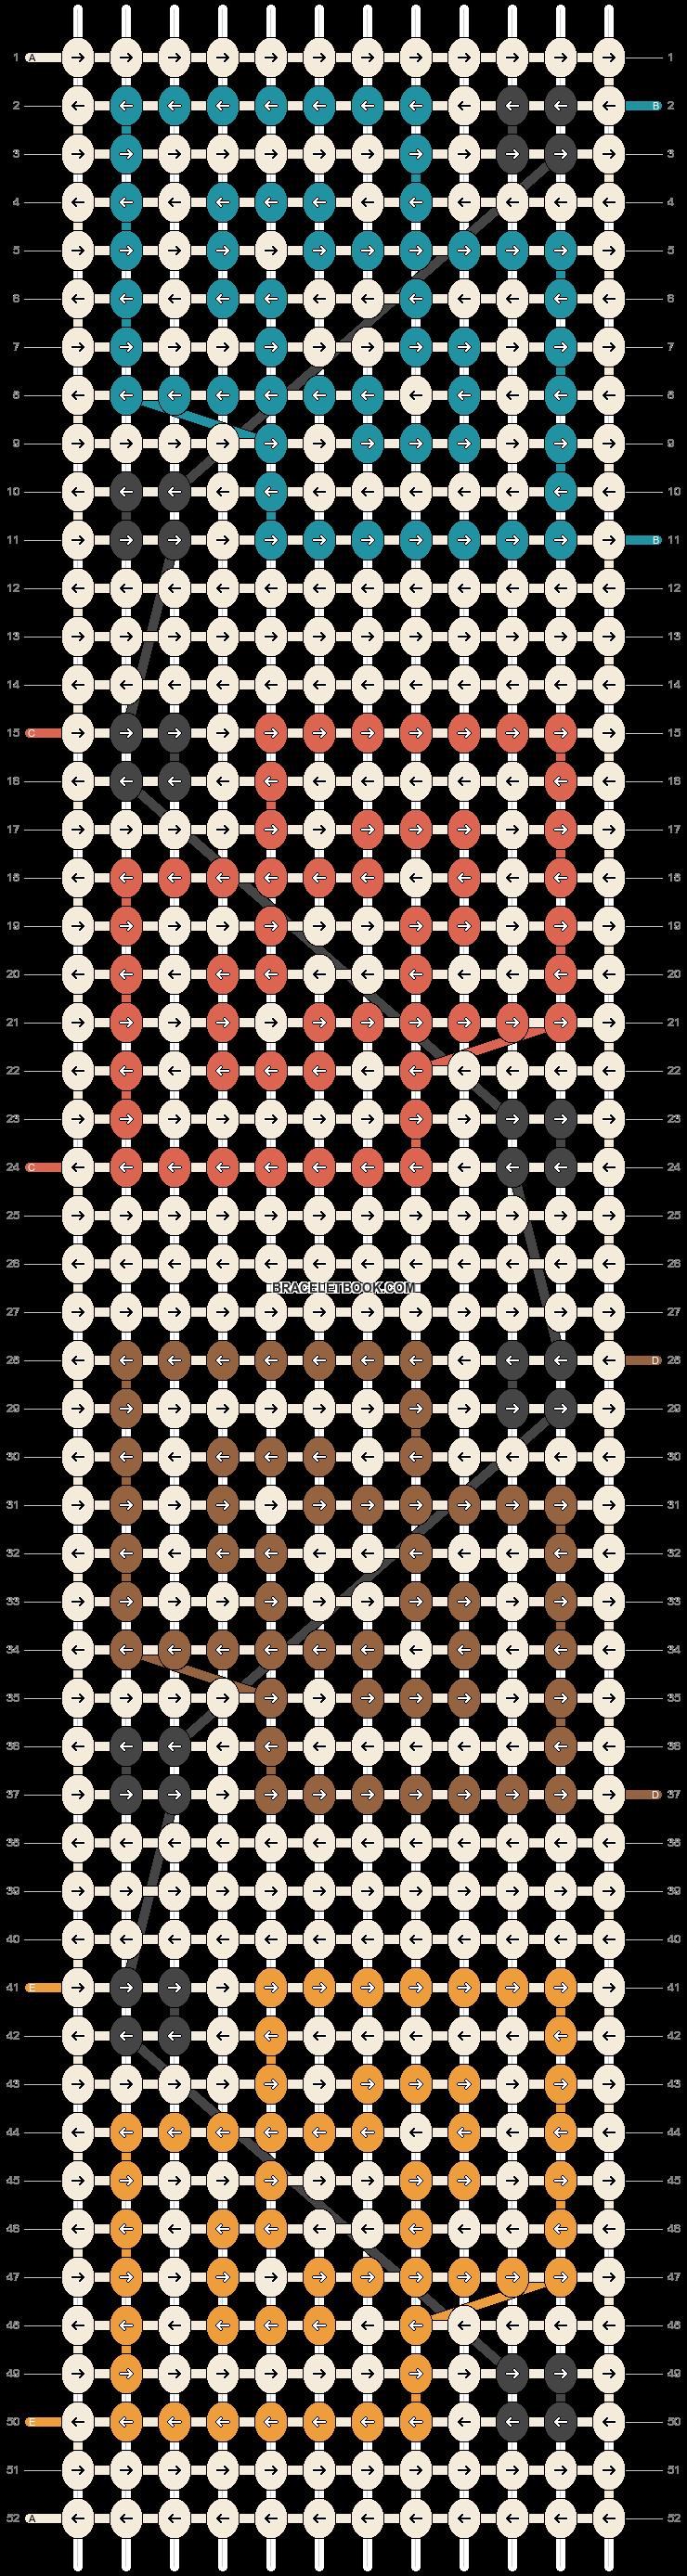 Alpha pattern #44319 pattern